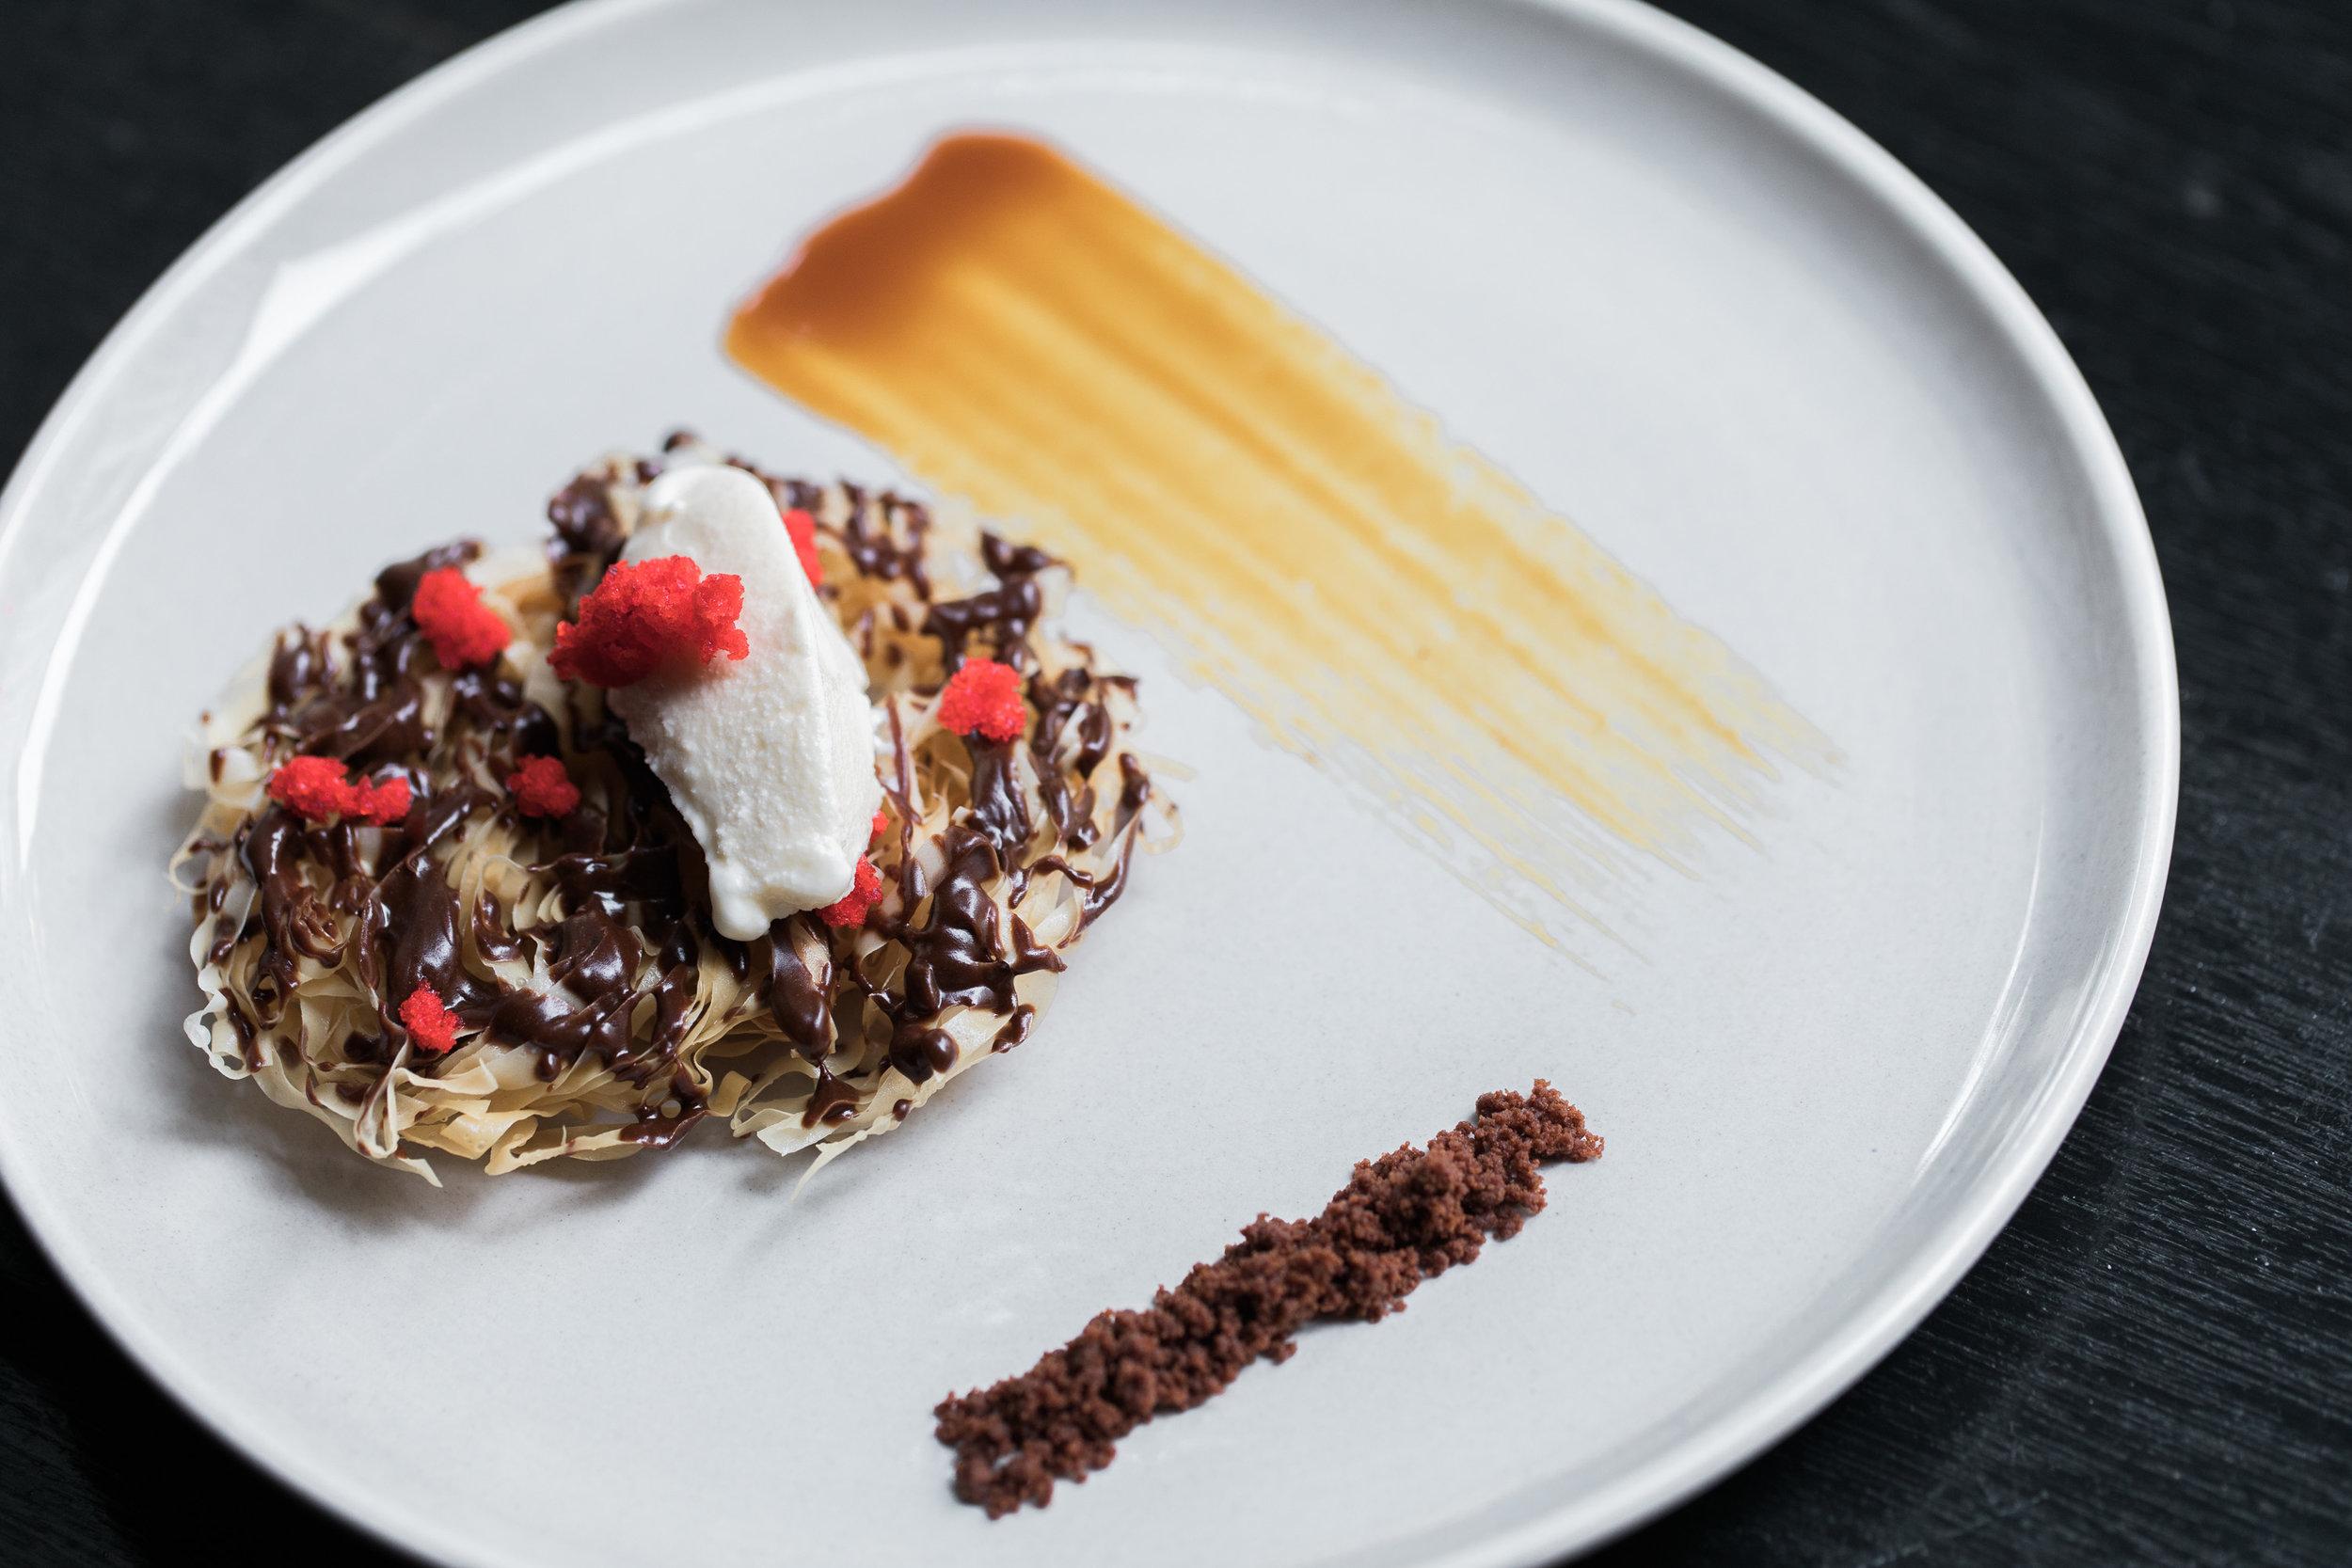 Phyllo Nest, Gianduja. Dehydrated Cherry Dust, Choco Cookie Crumble, Vanilla Cream Quenelle -- dessert .jpg